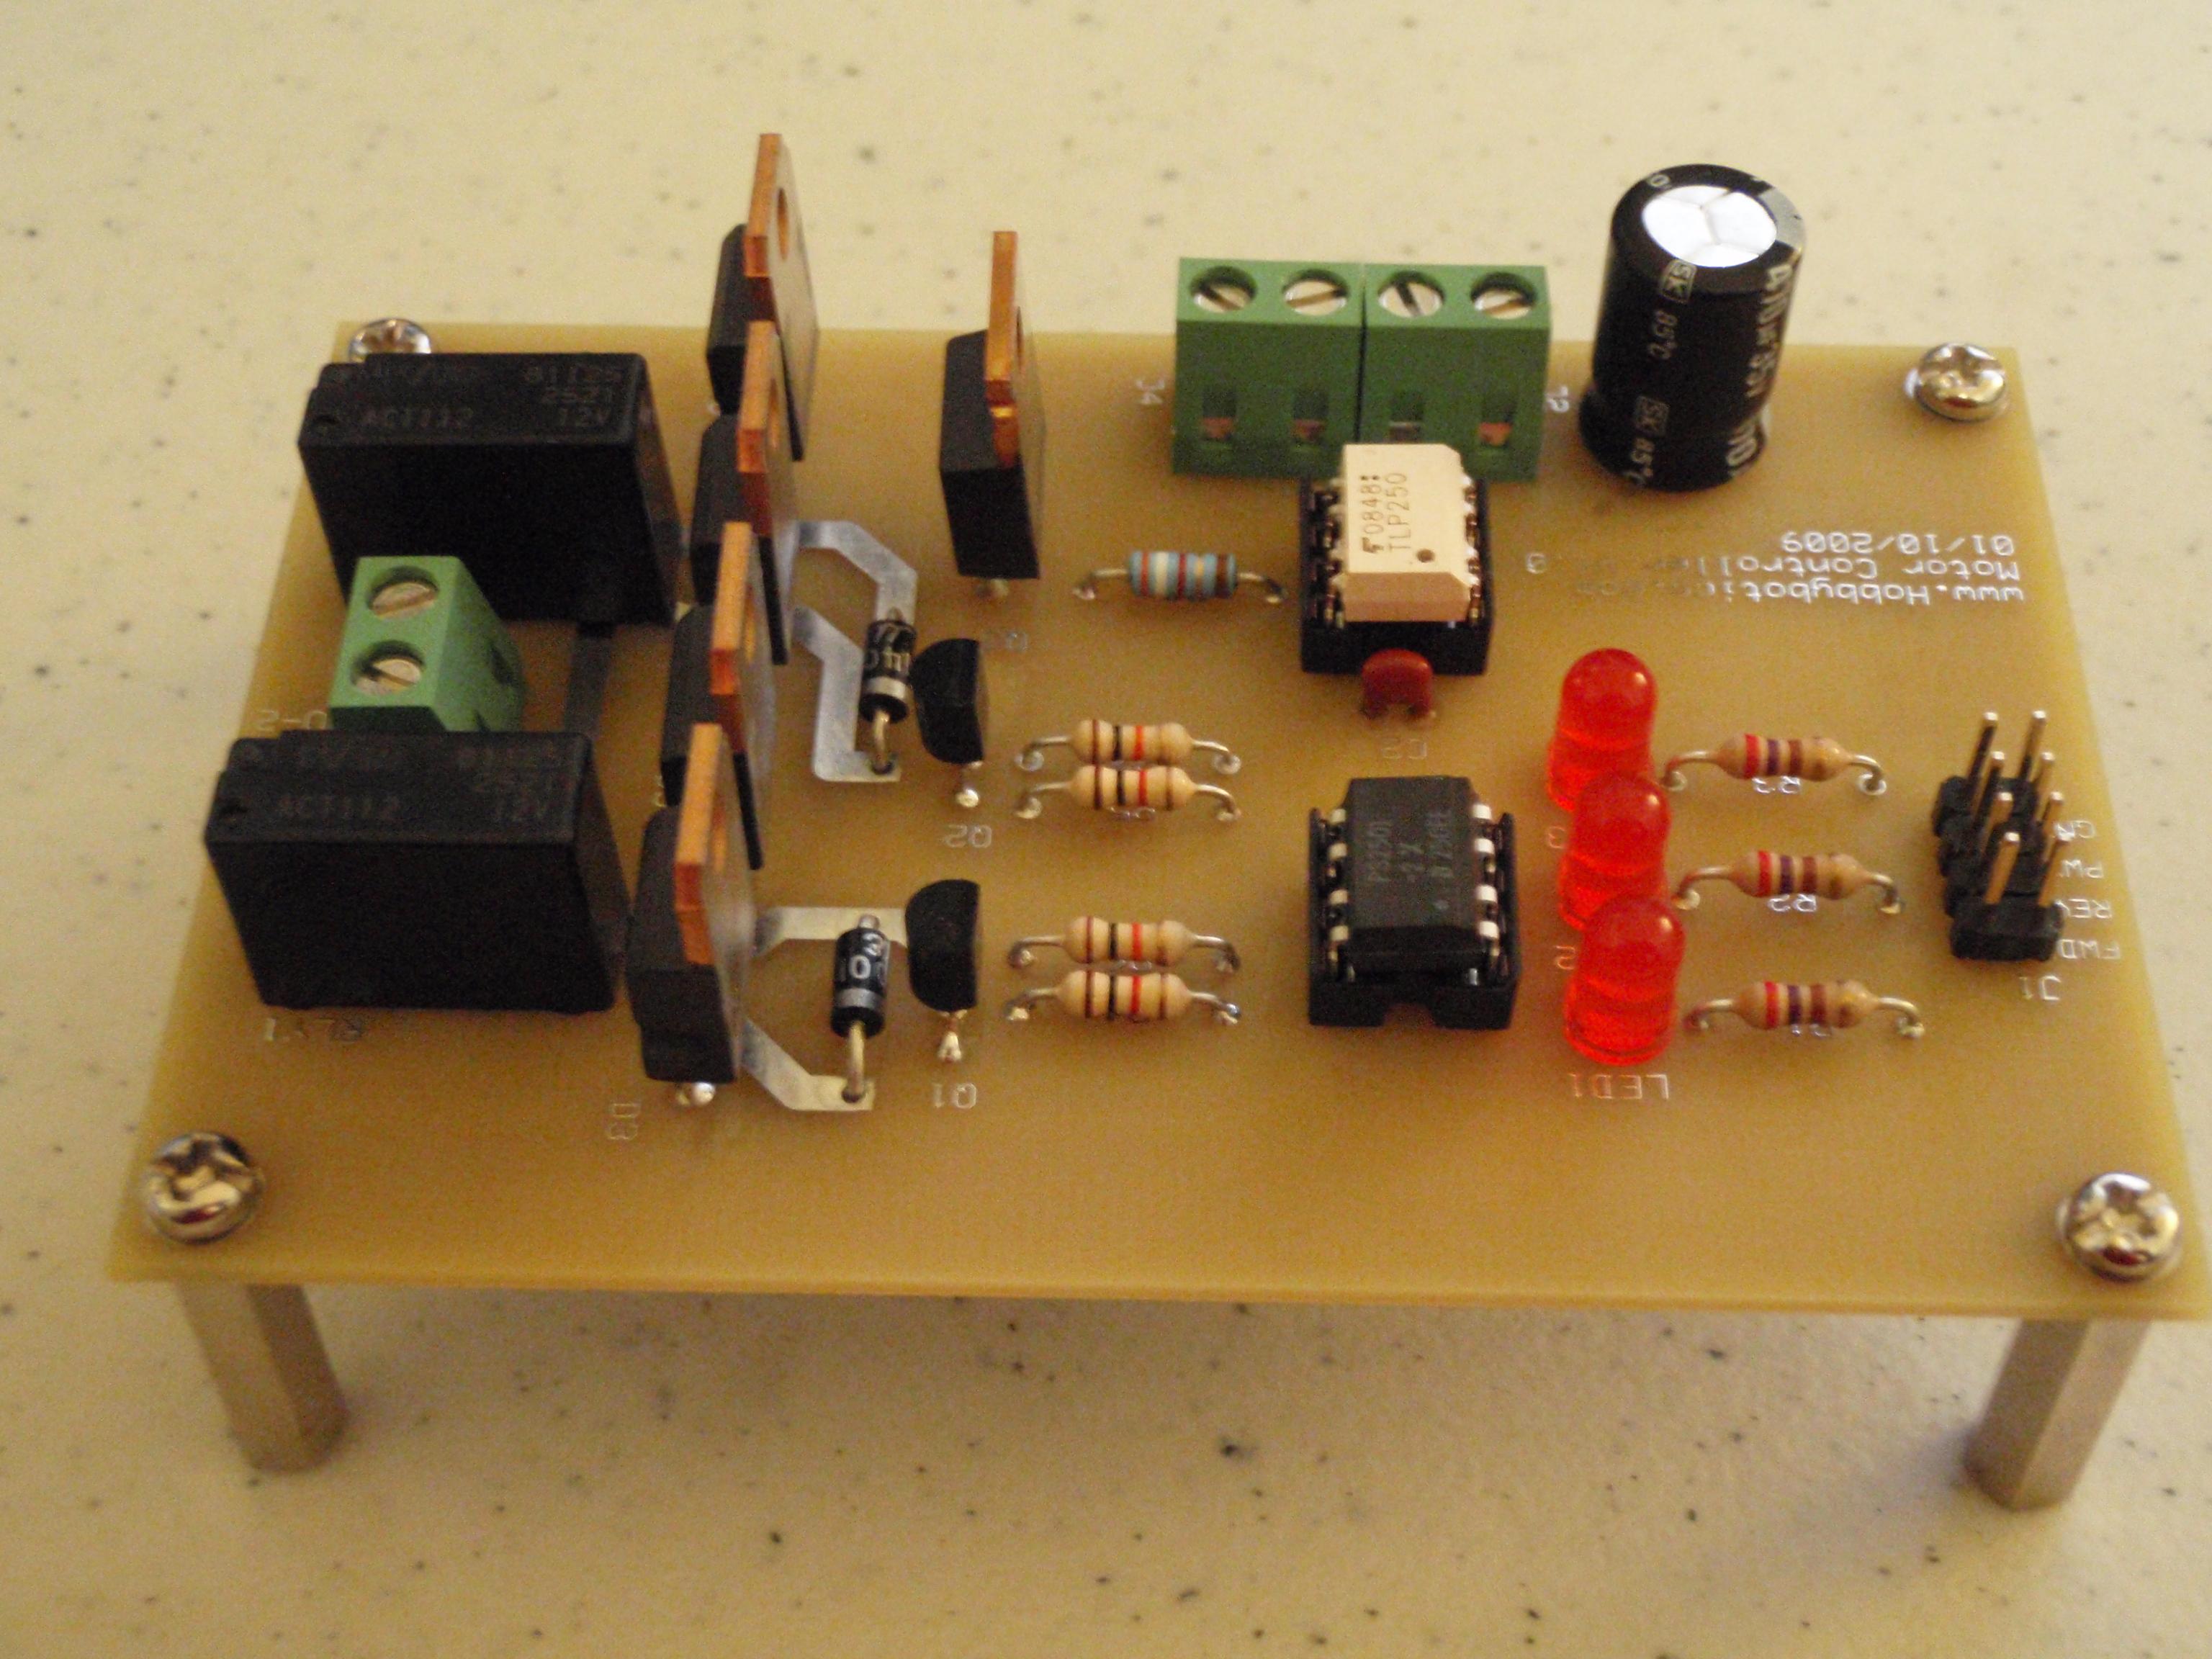 Hobbybotics Motor Controller V10 Bridge Driver Circuit Schematic Specifications